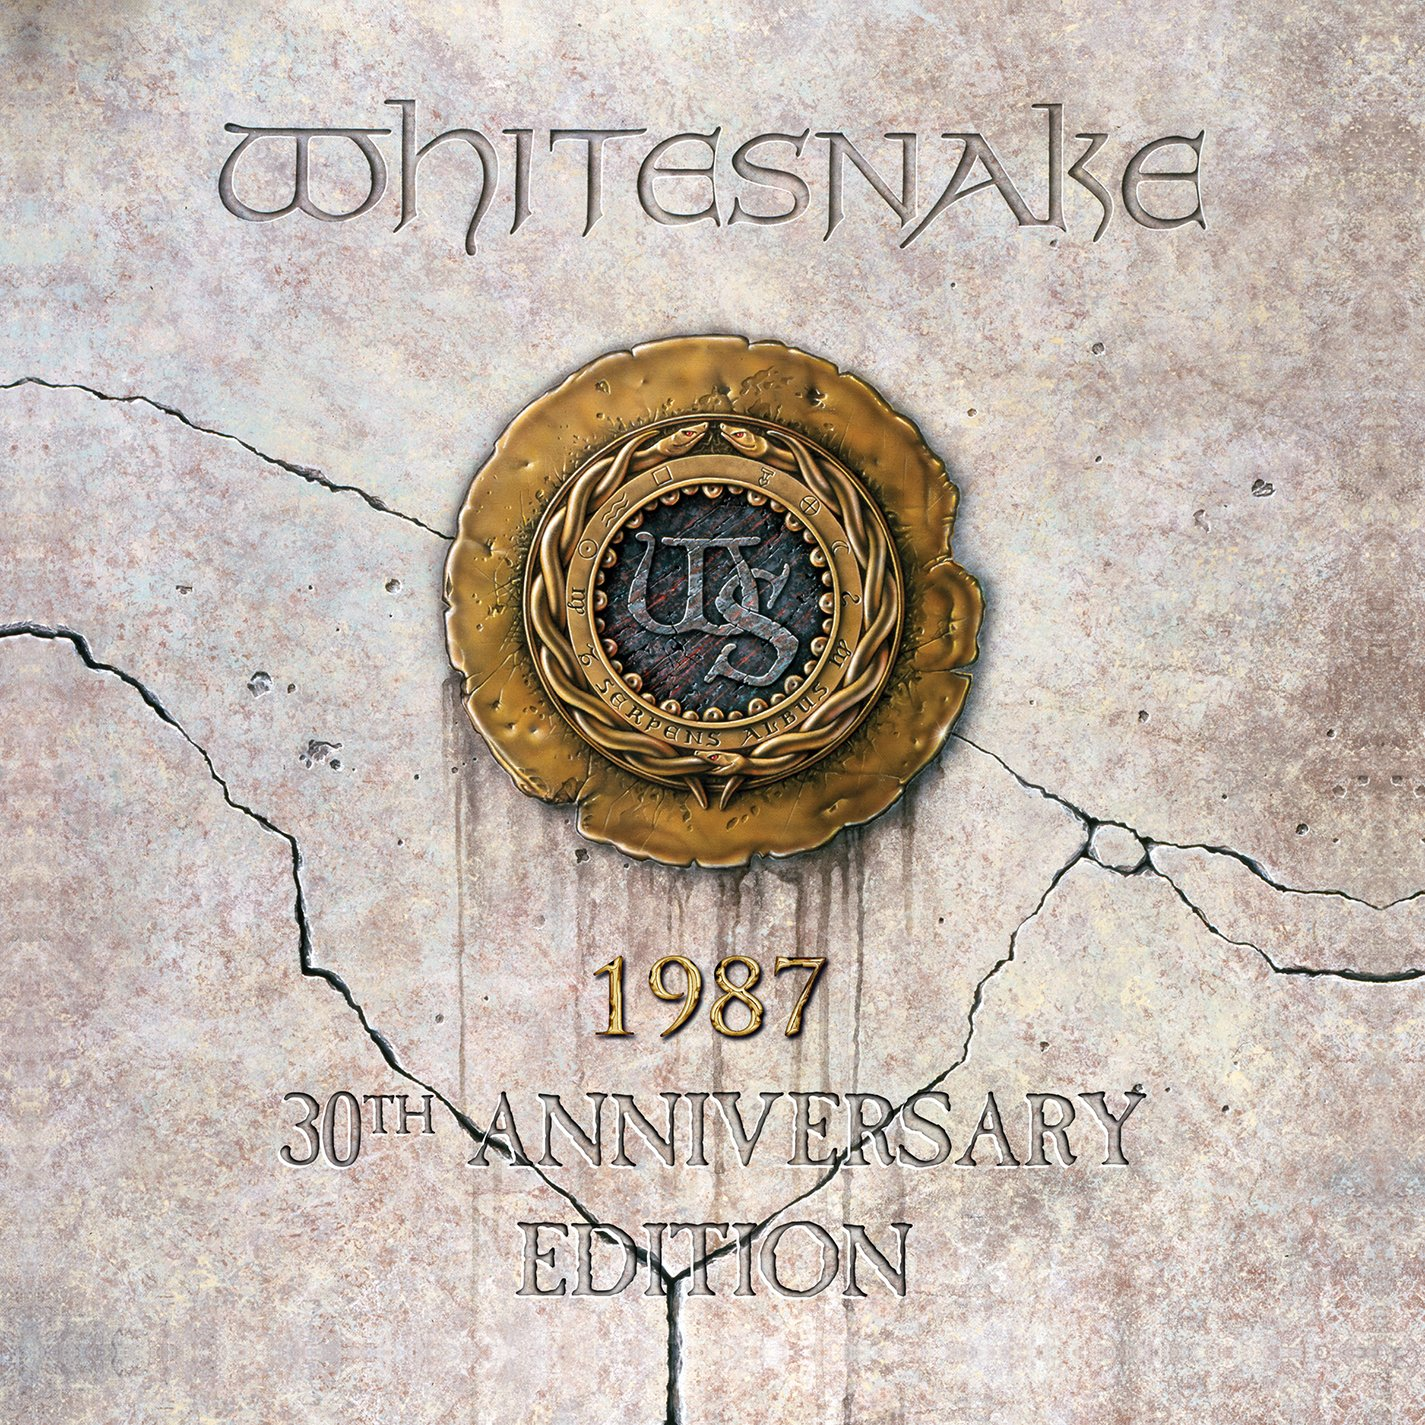 CD : Whitesnake - Whitesnake (30th Anniversary Edition) (Anniversary Edition)